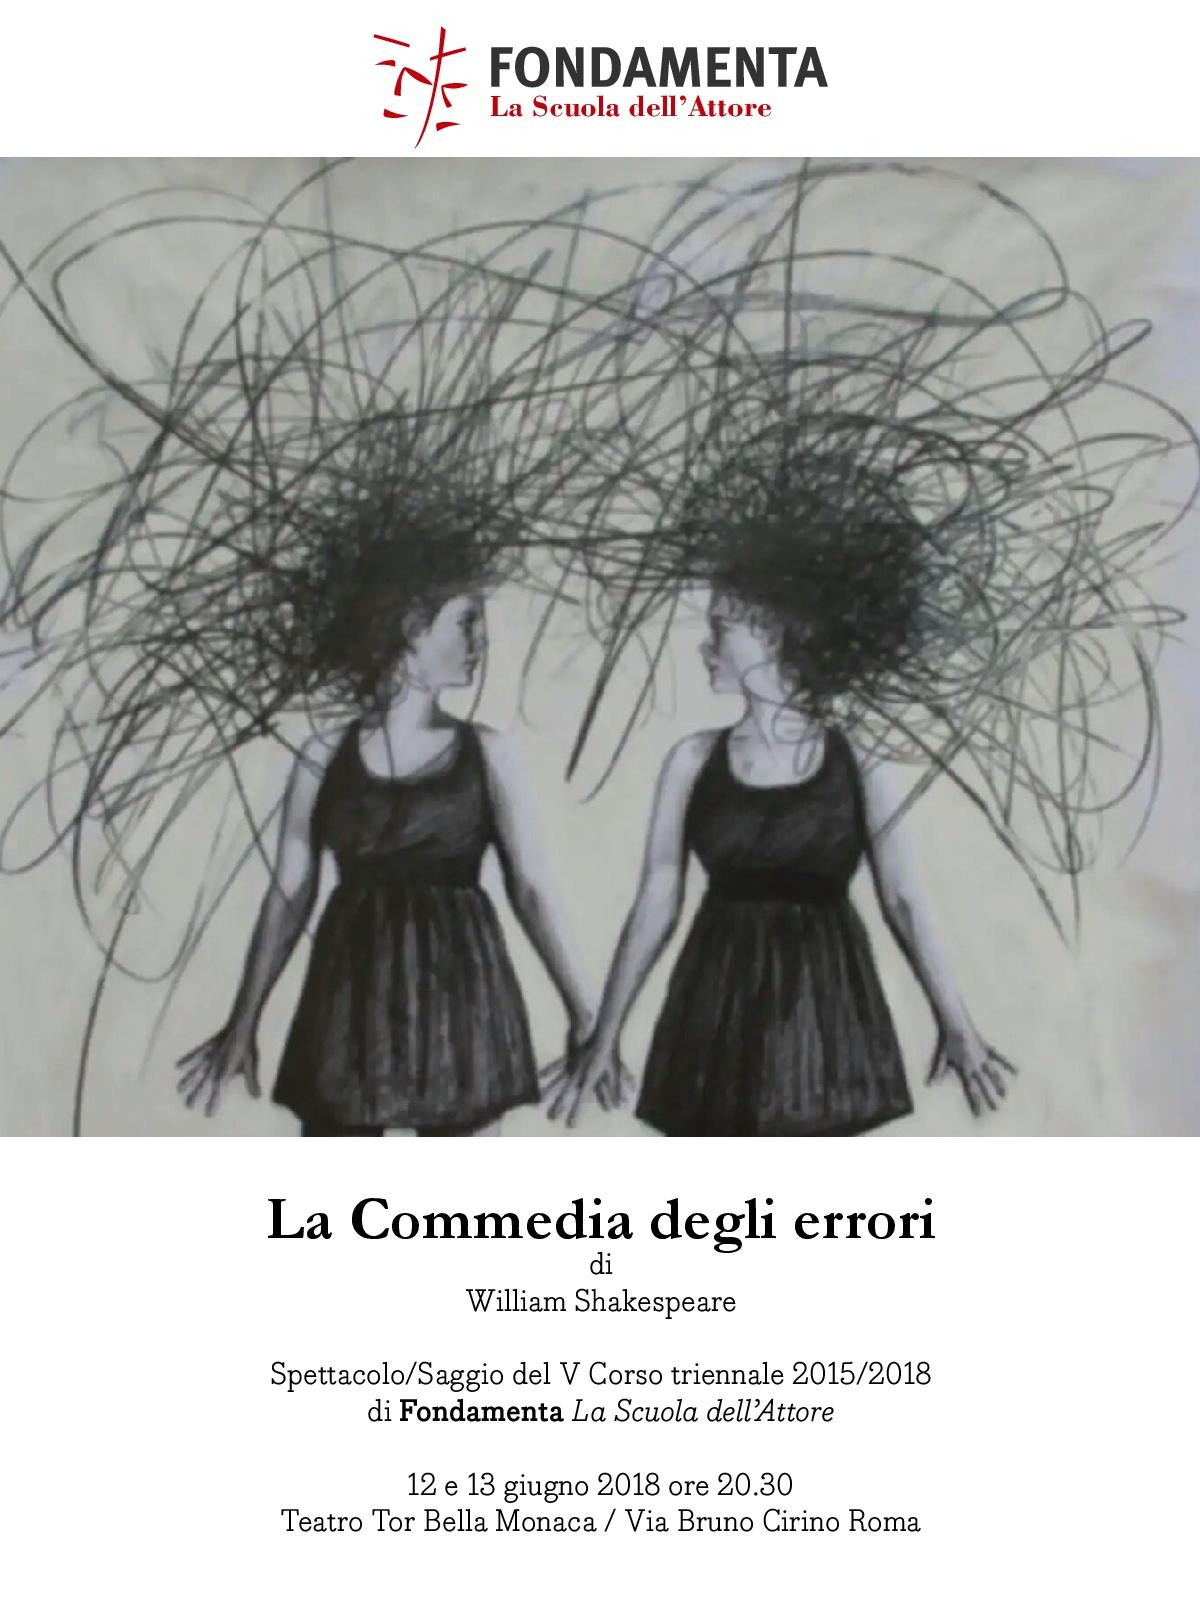 Teatro Tor bella Monaca: La Commedia degli Errori